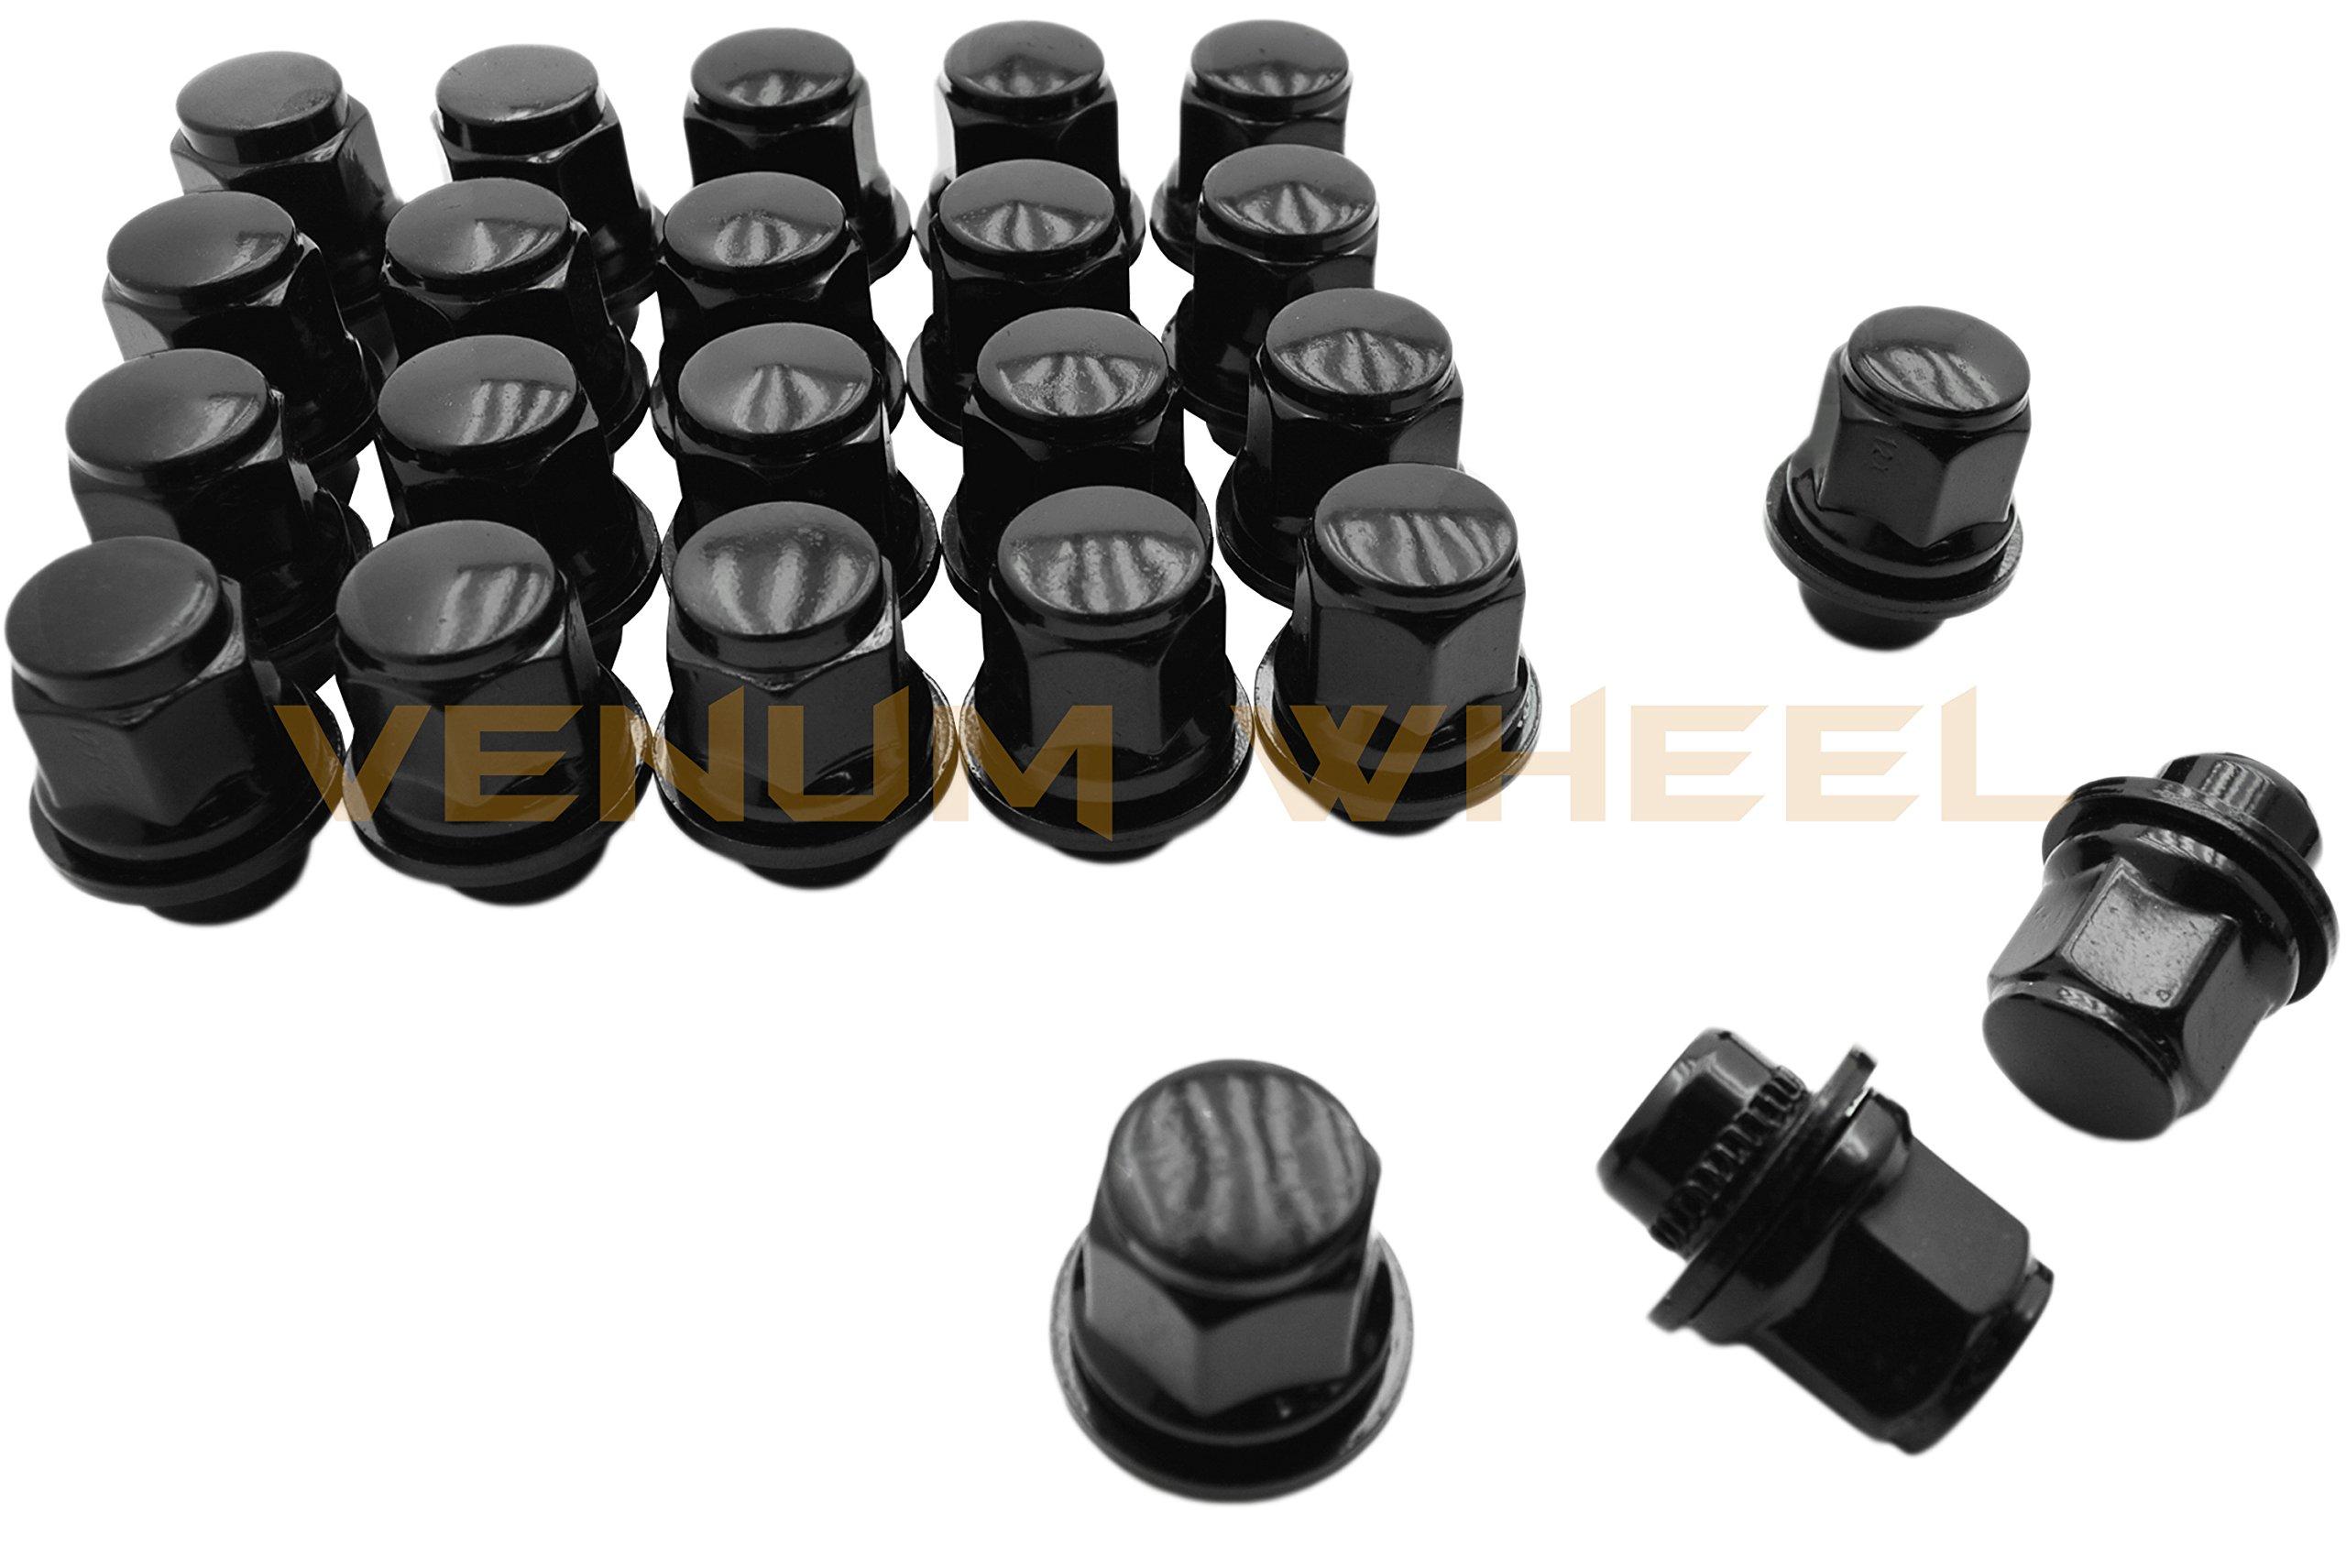 24 Pc Black Toyota Tacoma Tundra Fj Cruiser Oem Mag Seat Lug Nuts 12x1.5 1.45'' Tall 6 Lug by Venum wheel accessories (Image #4)